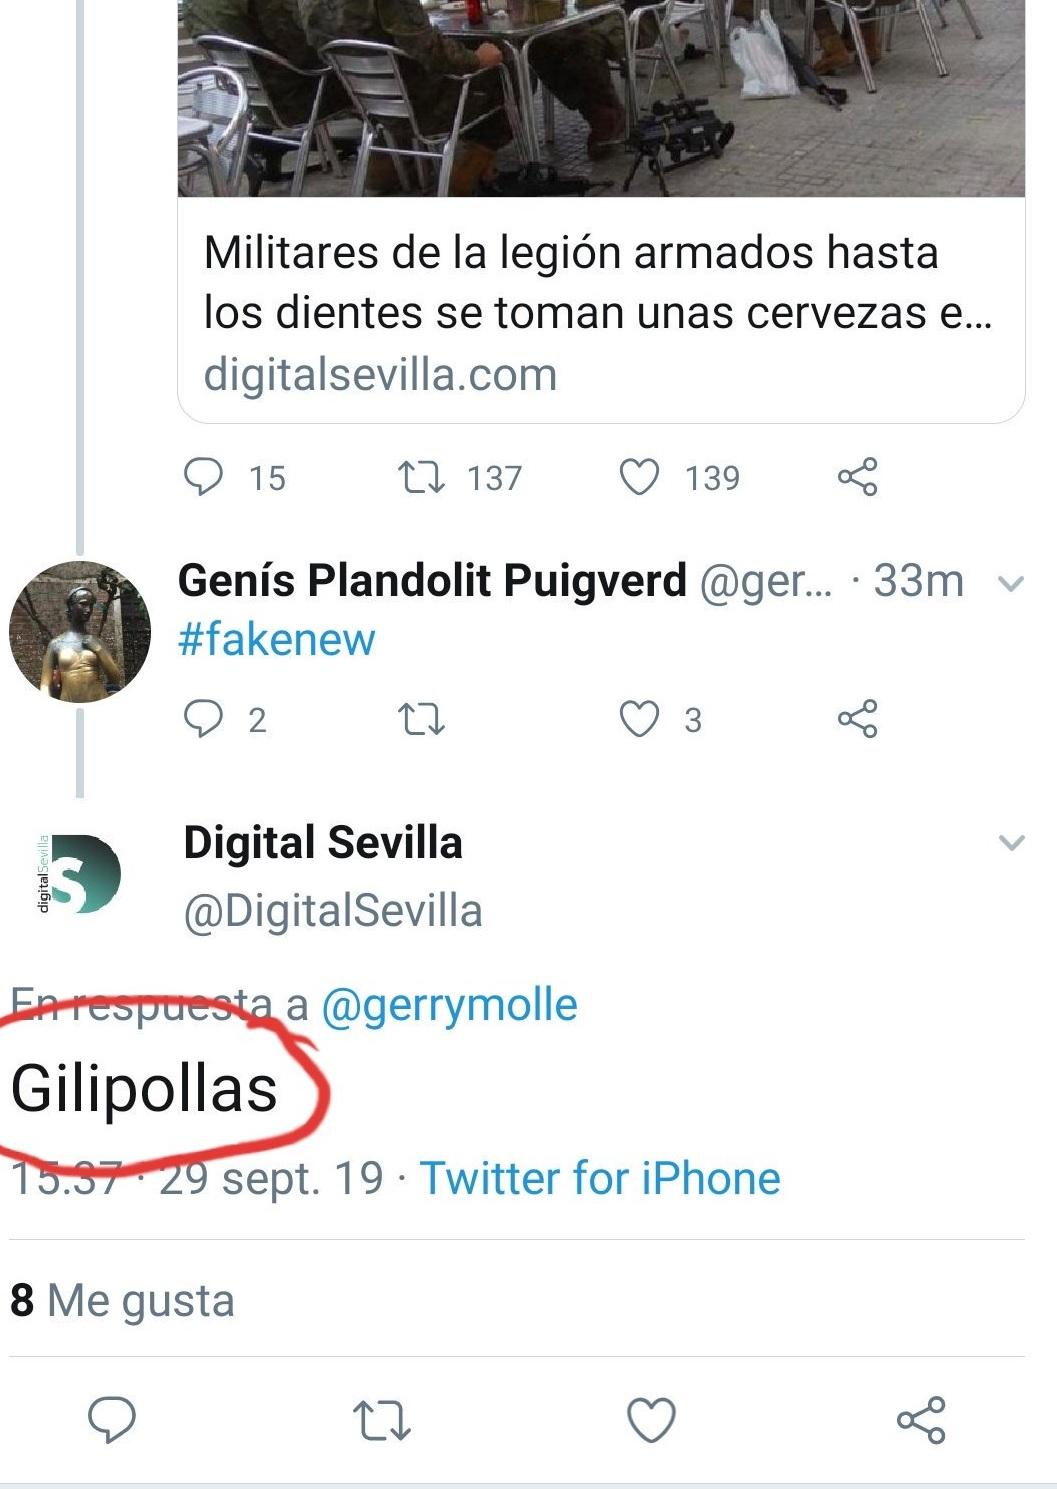 Digital de Sevilla tiene un CM a la altura de sus titulares